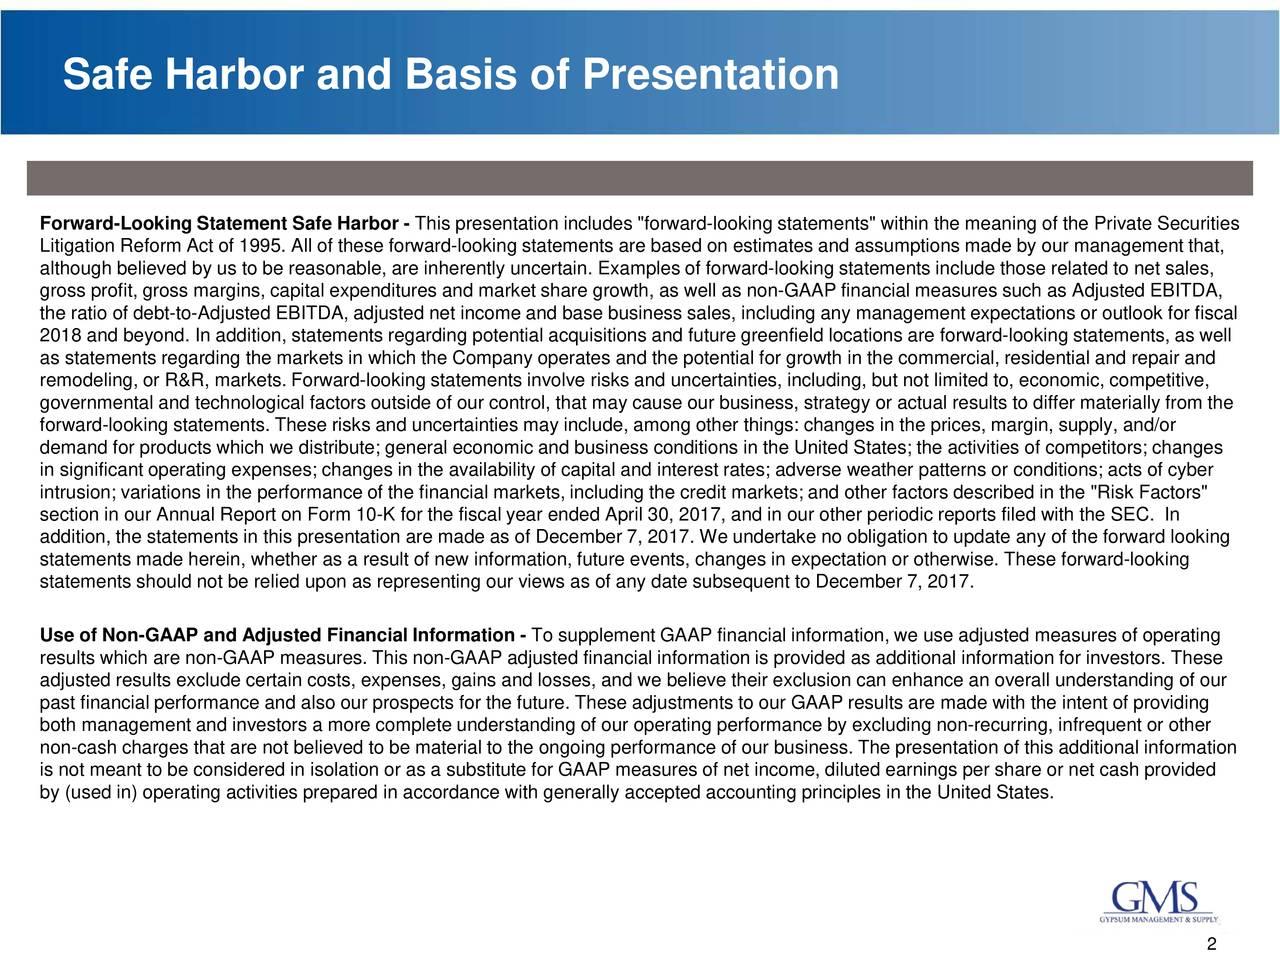 Safe Harbor and Basis of Presentation